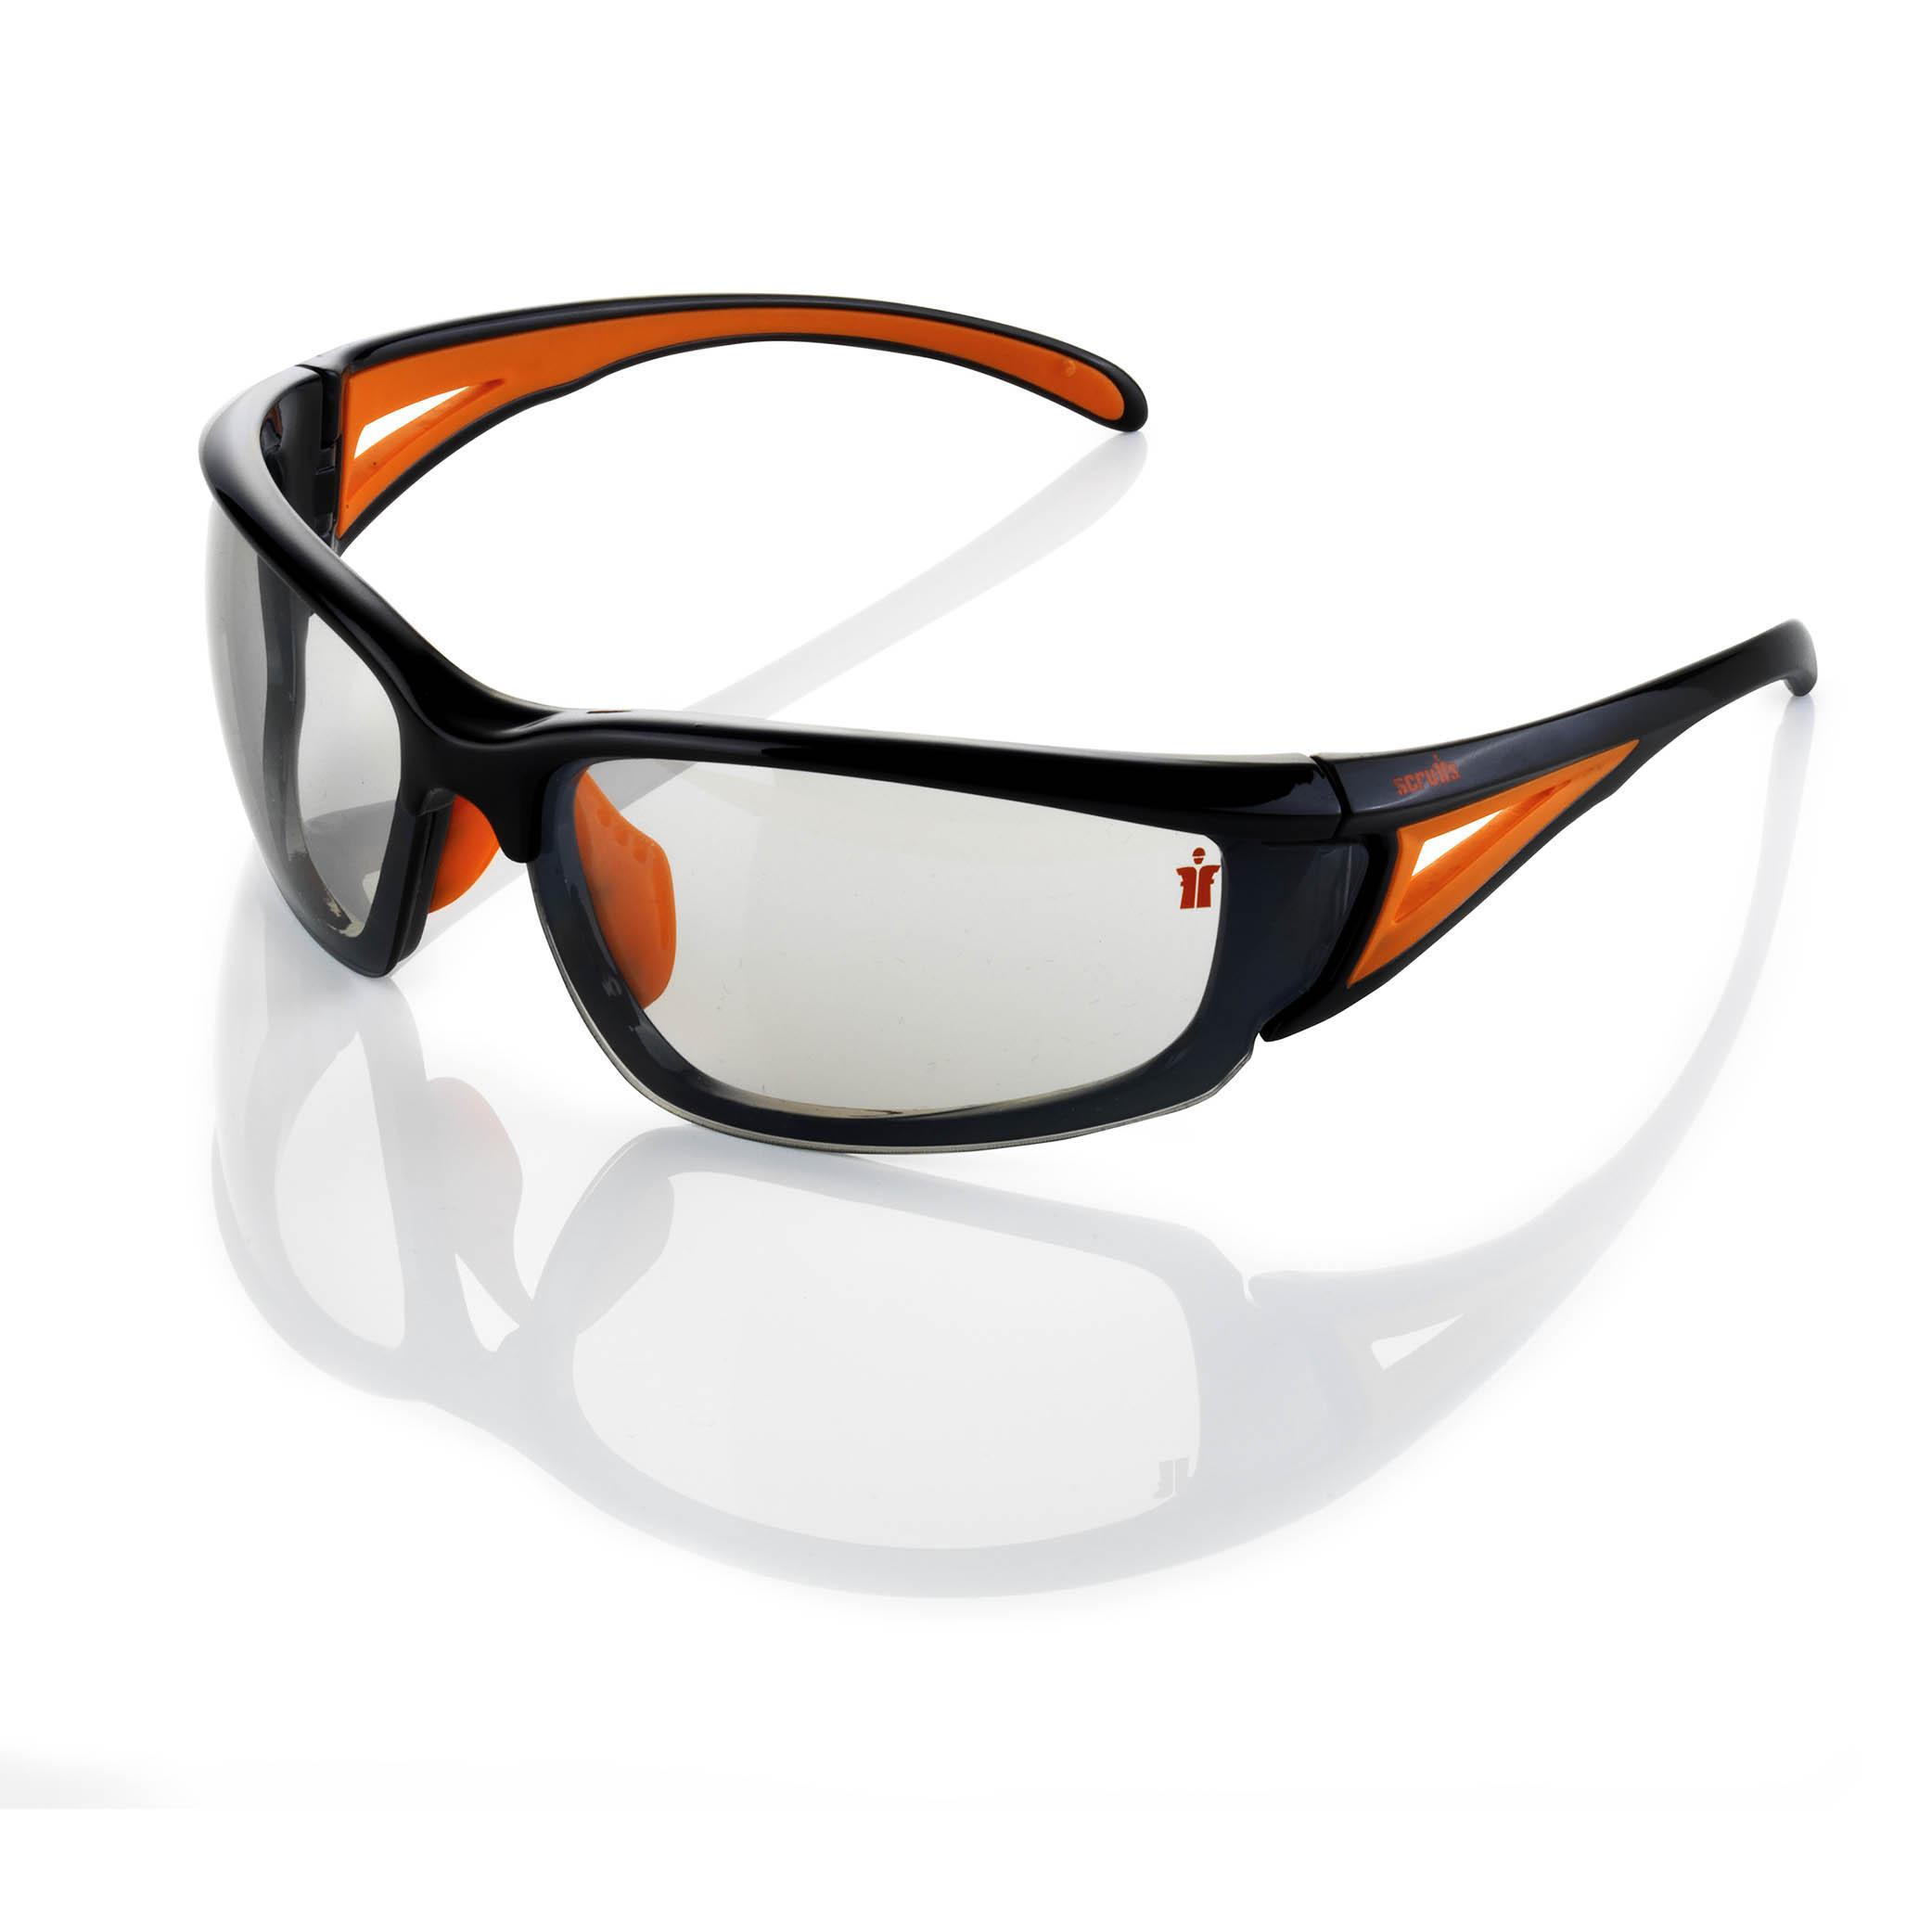 Hawk Specs